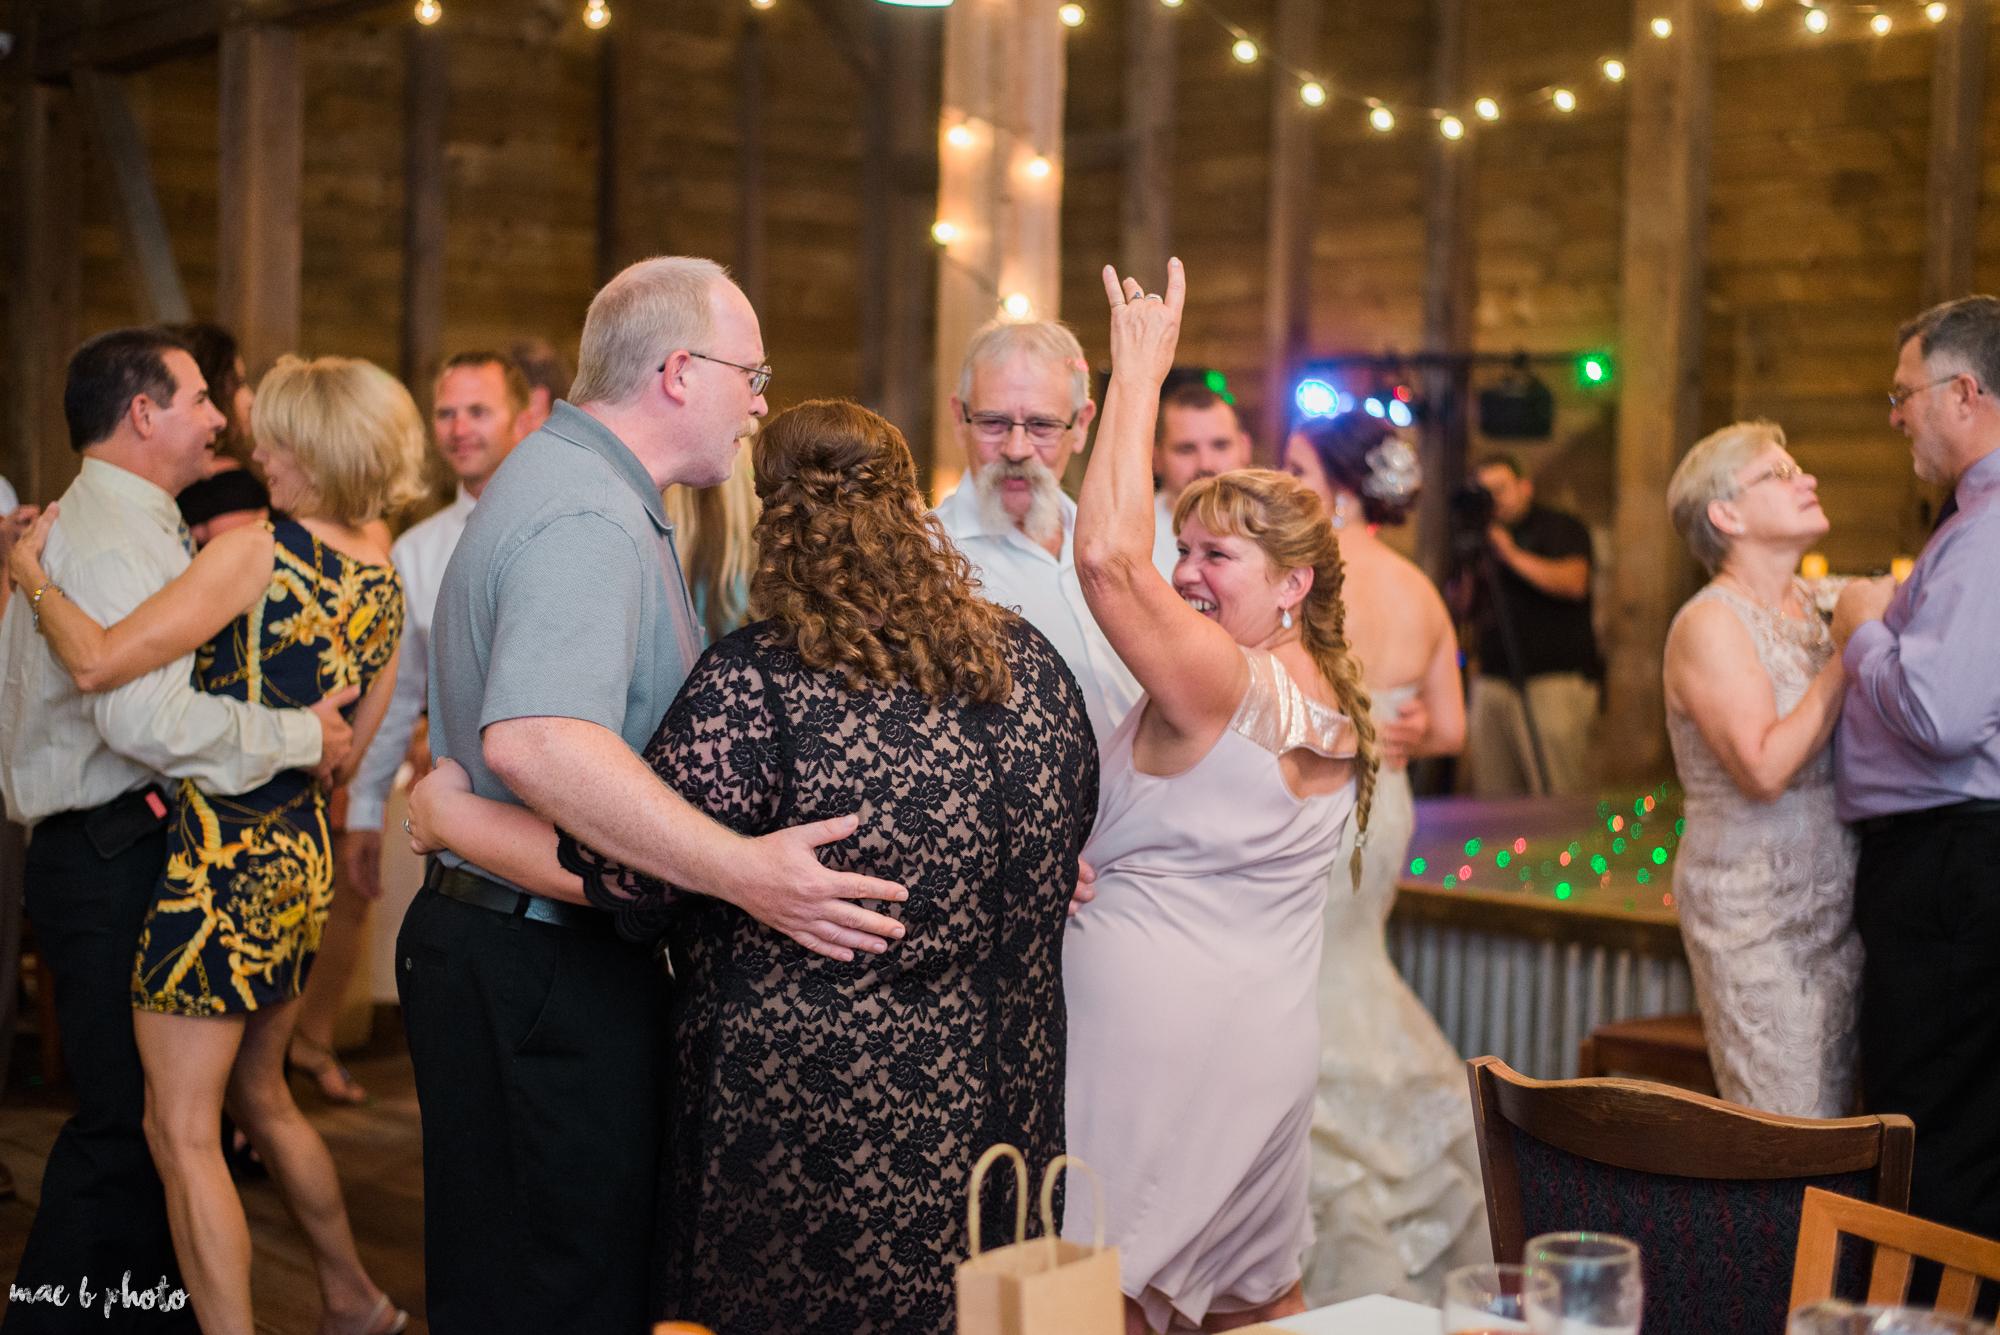 Sarah & Dustin's Rustic Chic Barn Wedding at Hartford Hill Winery in Hartford, Ohio by Mae B Photo-113.jpg